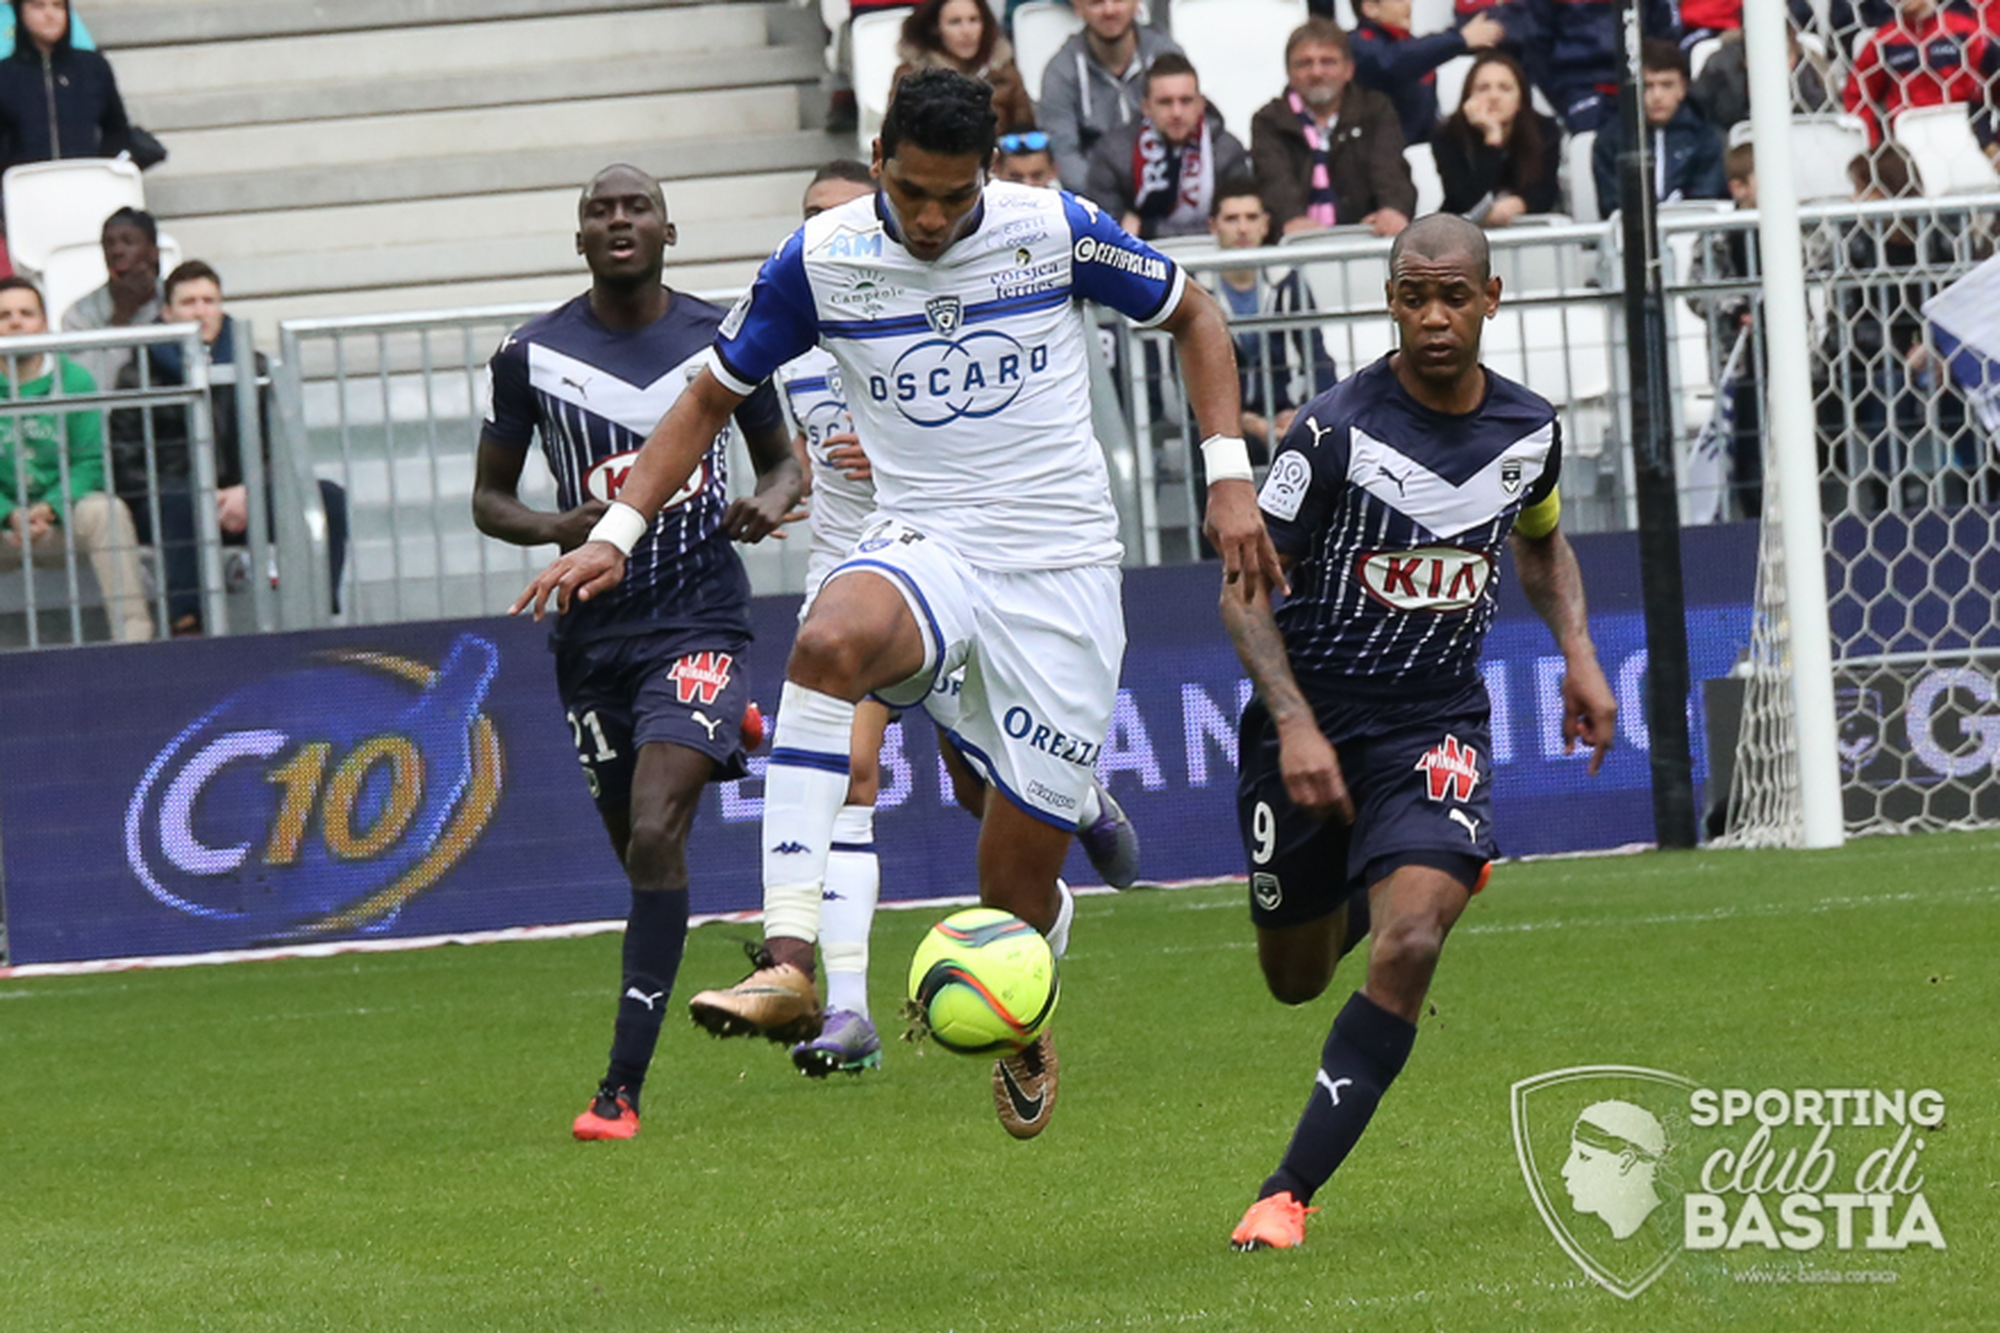 Bordeaux - Bastia